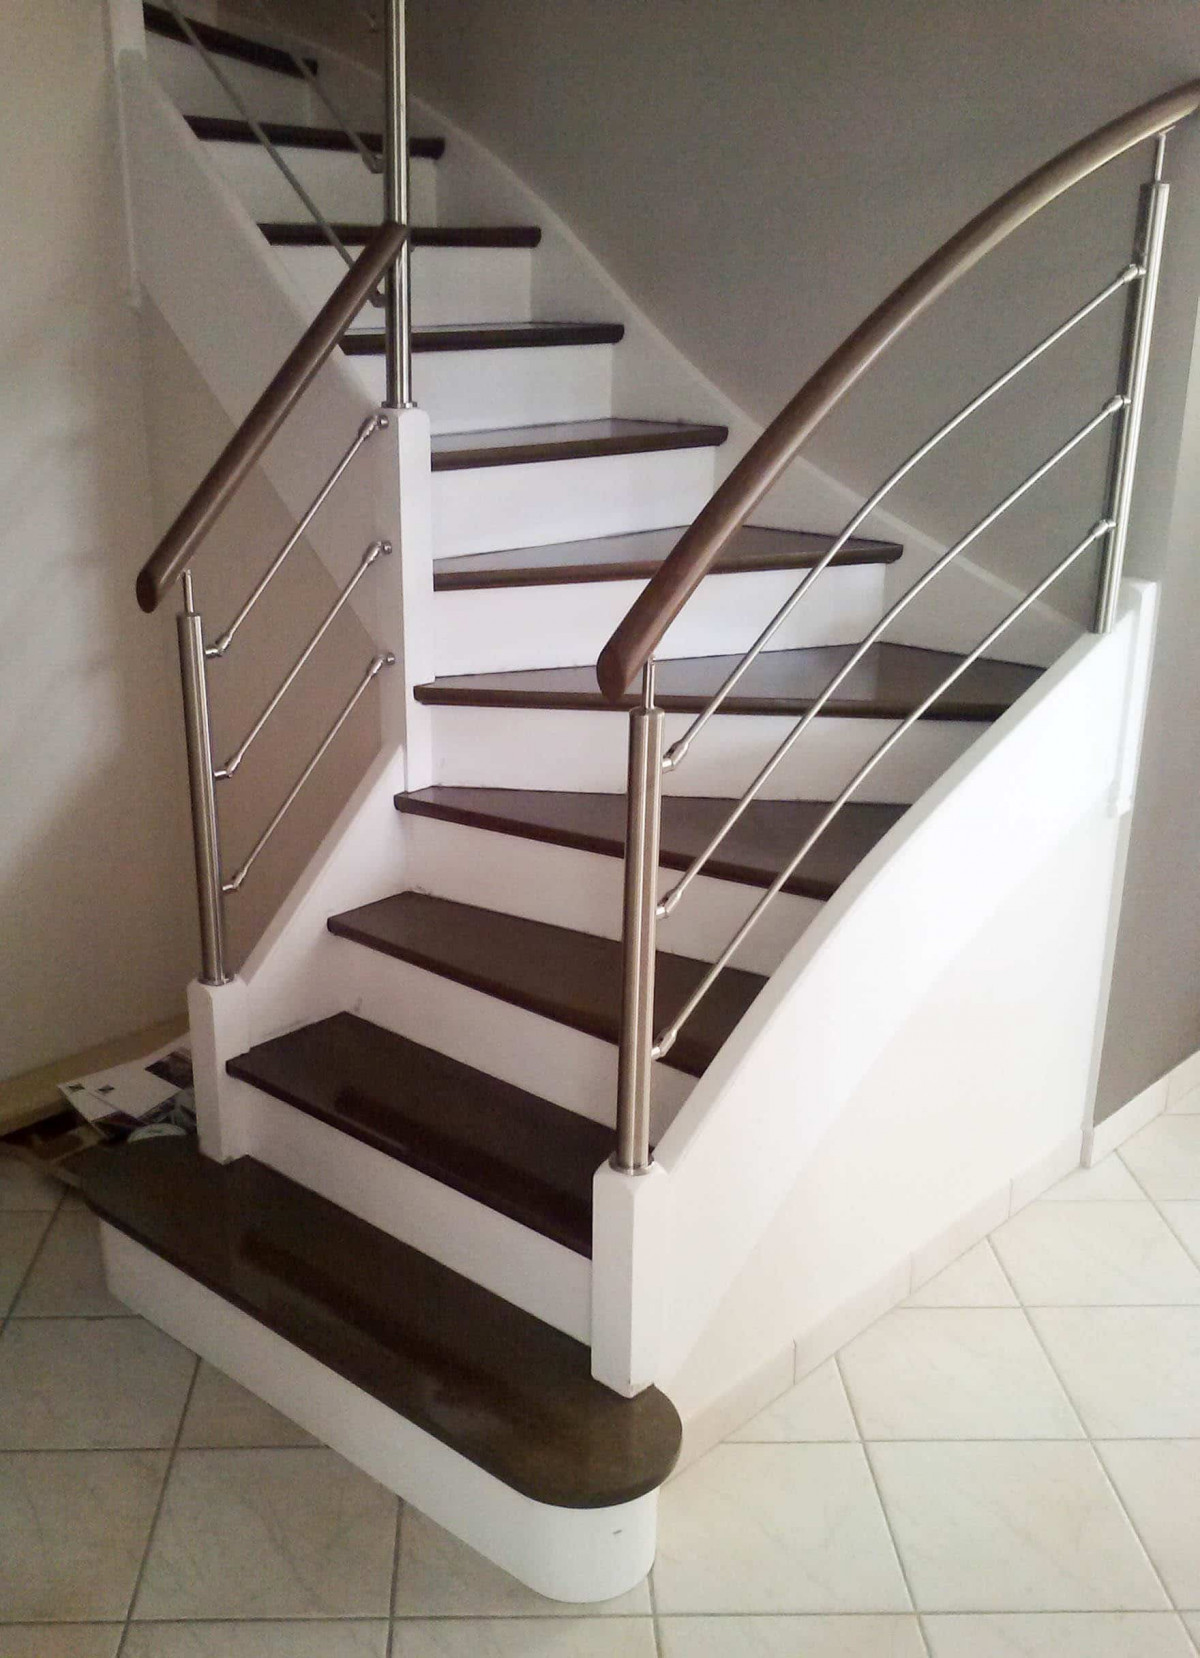 avant apr s escalier et sa rambarde sur mesure par divinox. Black Bedroom Furniture Sets. Home Design Ideas